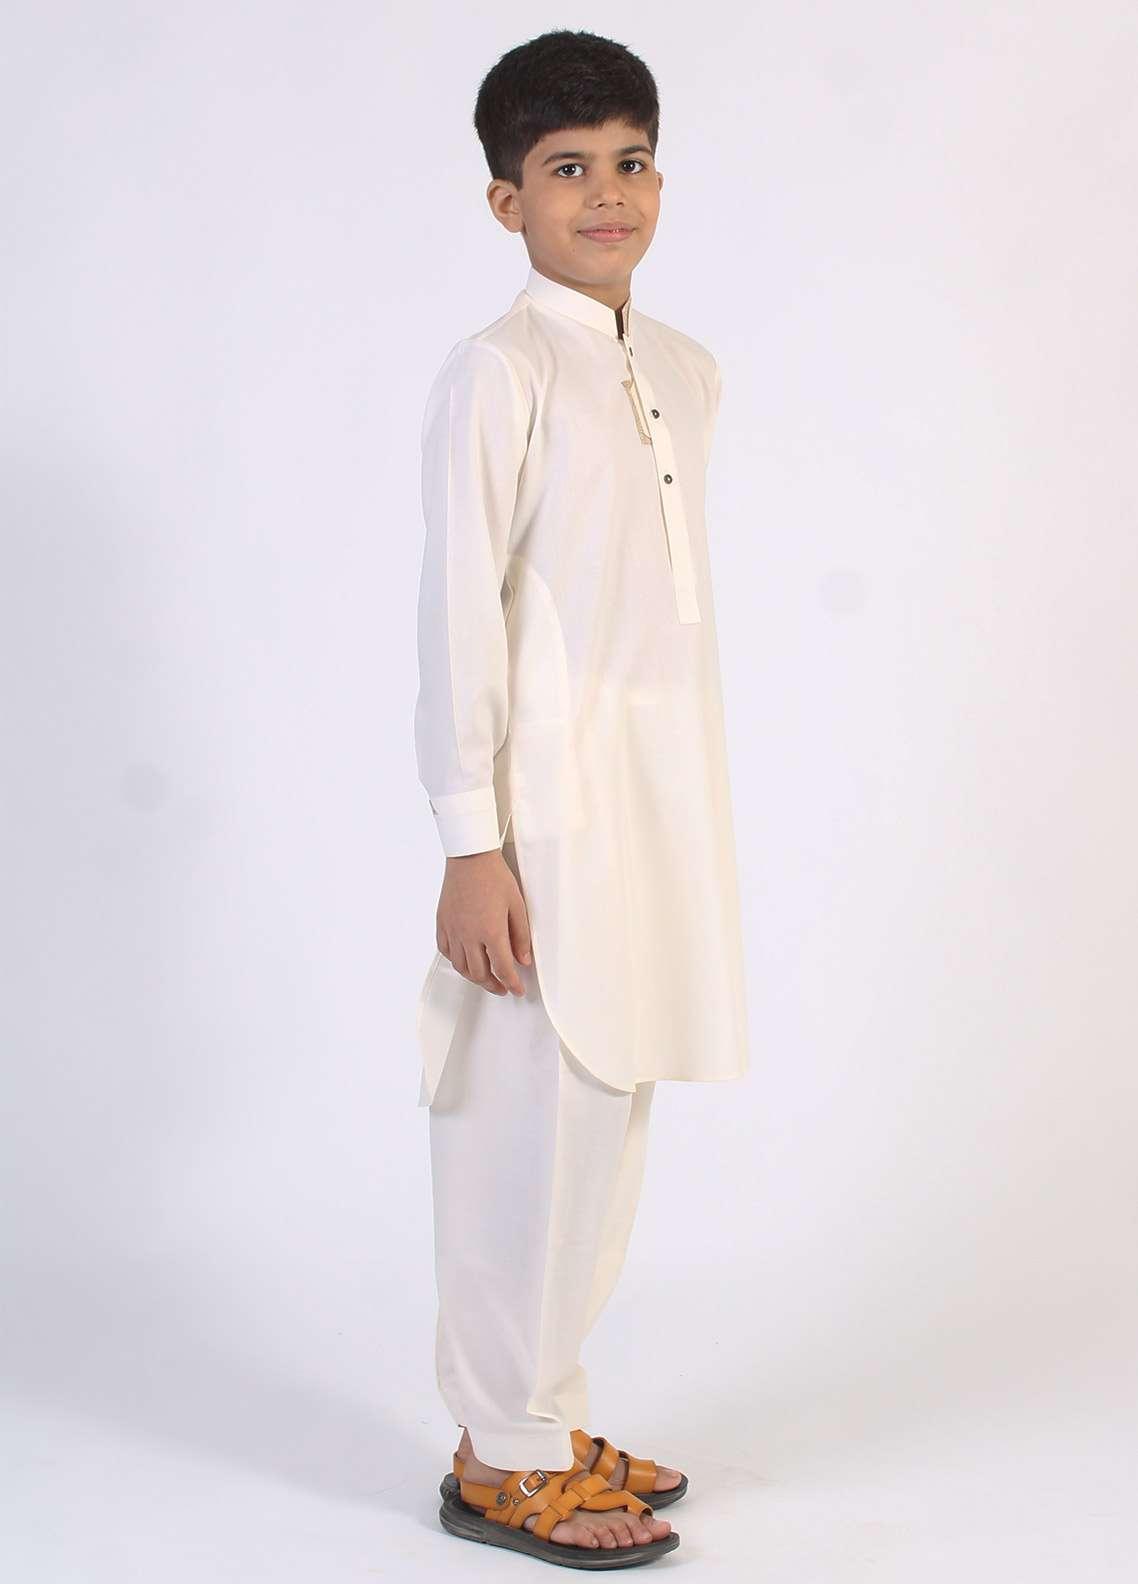 Aizaz Zafar Cotton Embroidered Kameez Shalwar for Boys - Off White AZ18B 202